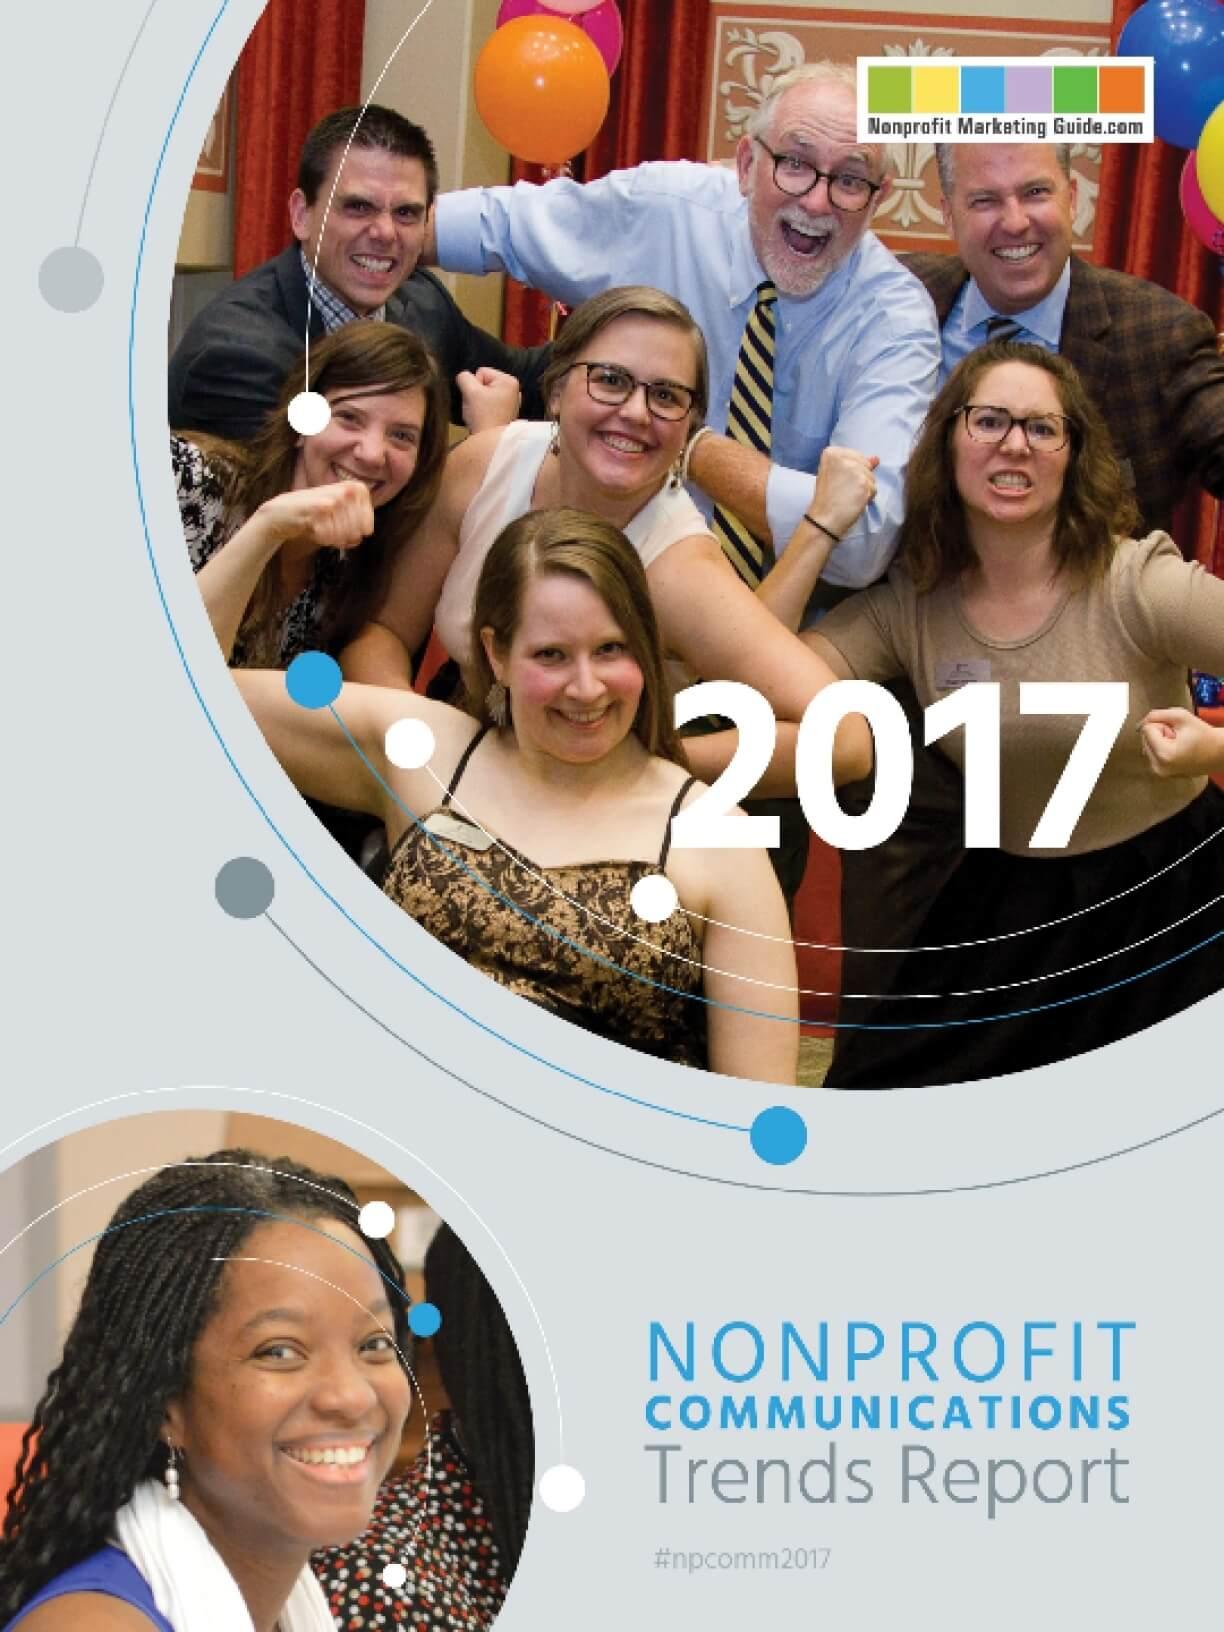 2017 Nonprofit Communications Trends Report